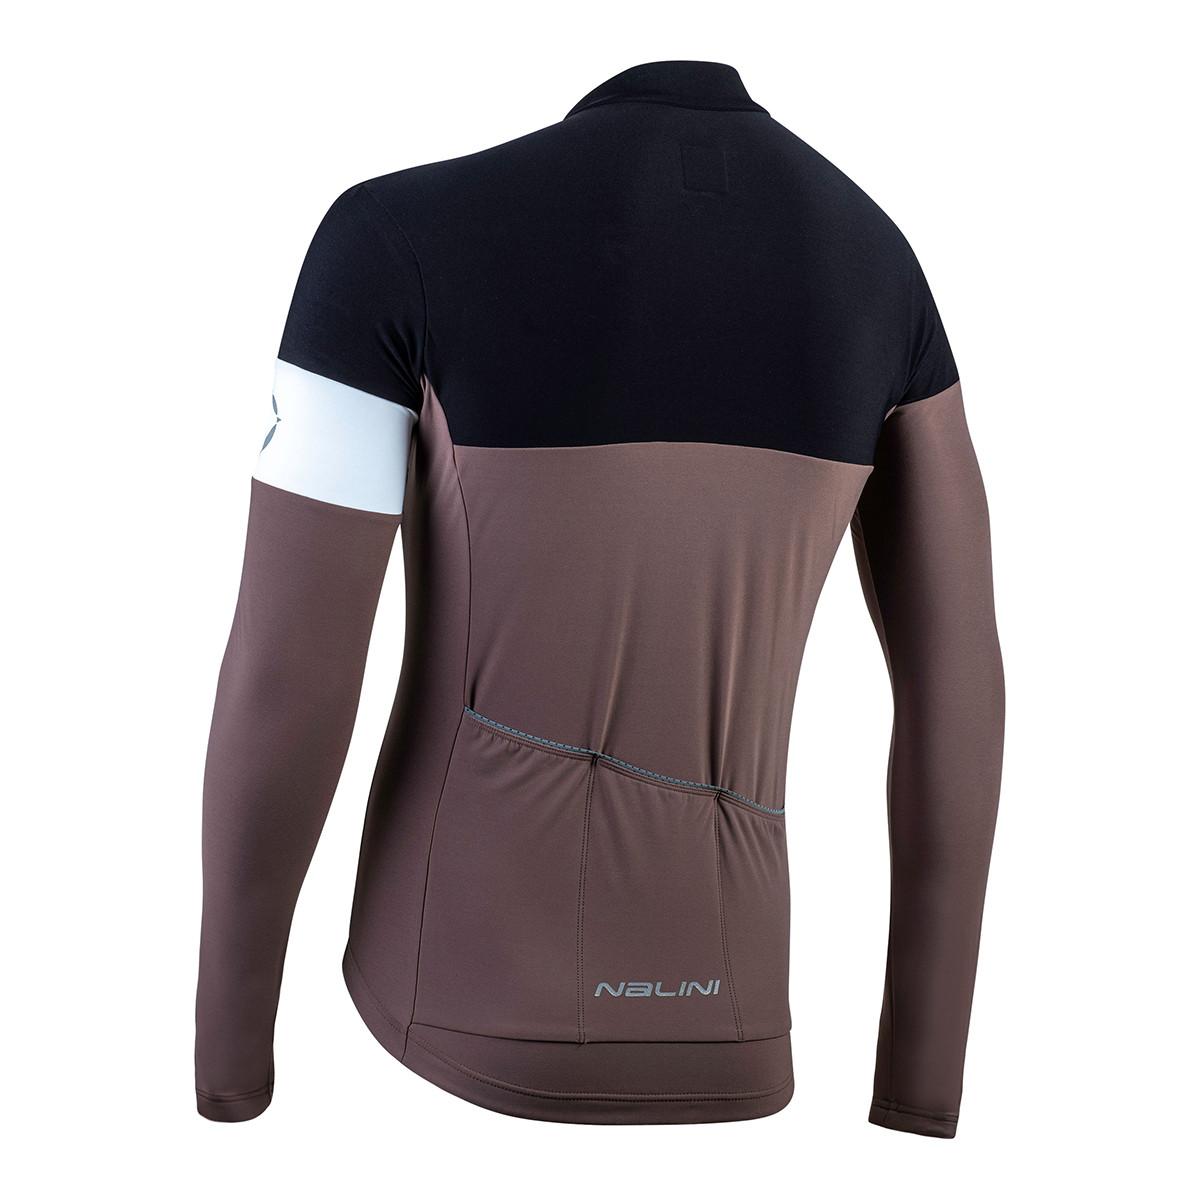 Nalini Pro Corsa B0W Brown Long Sleeve Jersey Rear